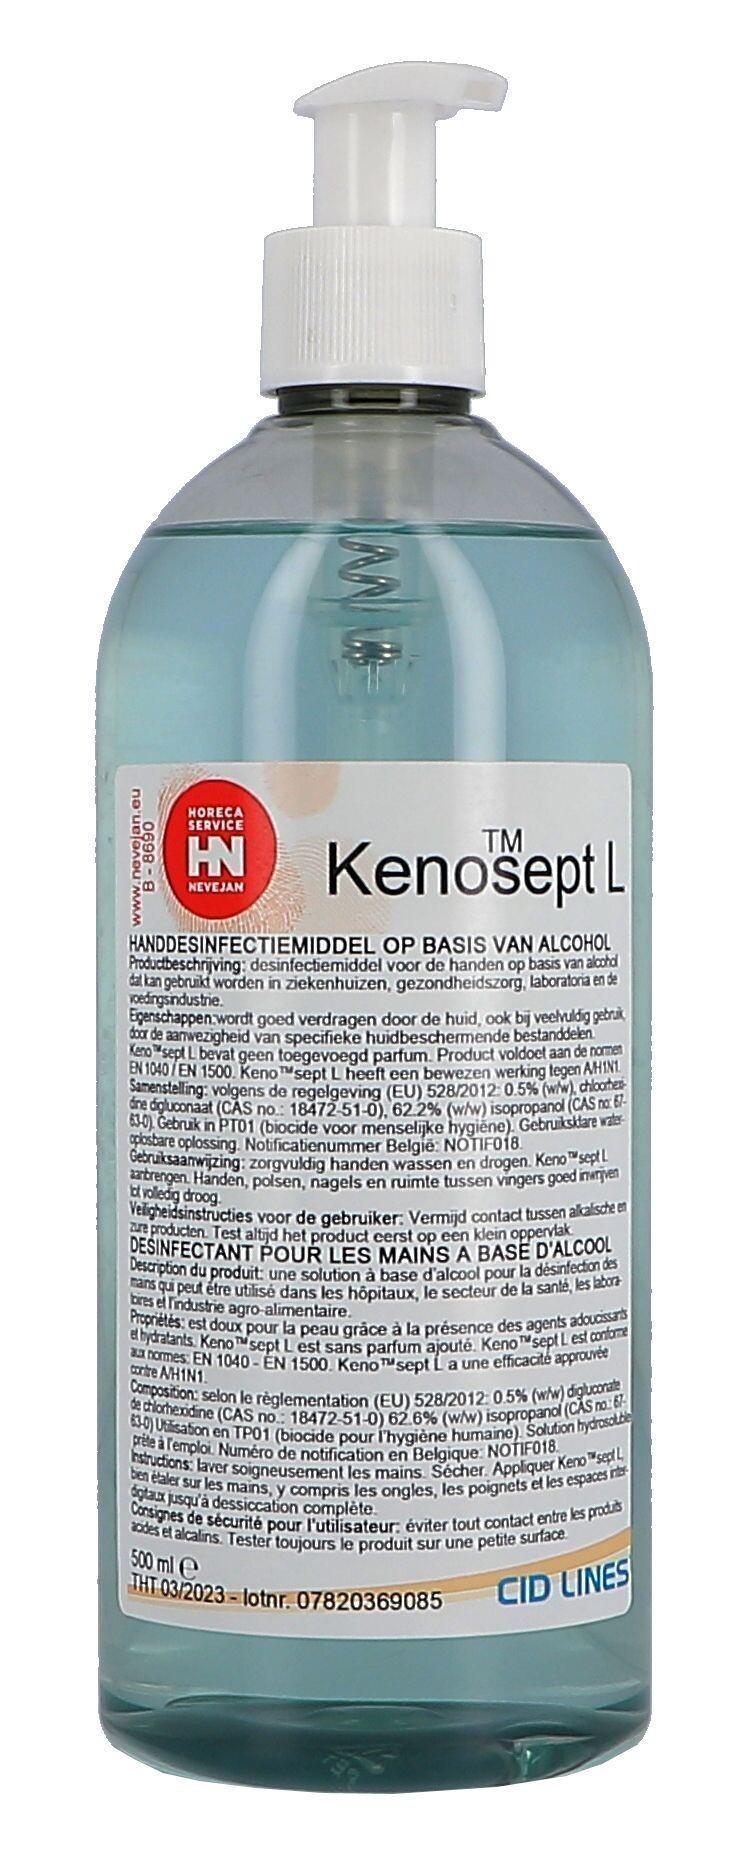 Kenosept-L Disinfection for hands 500ml Cid Lines (Hygiëneproducten)